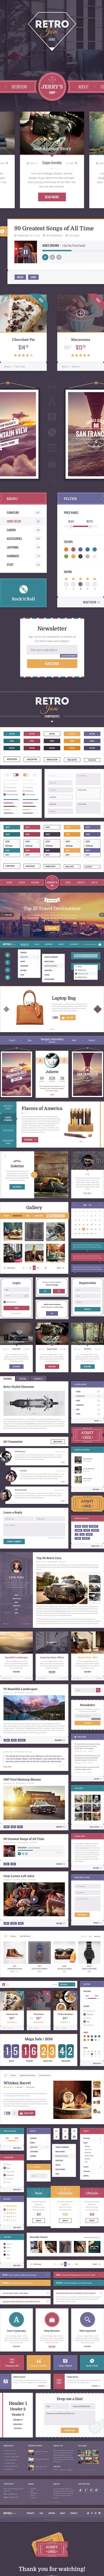 Retro Jam UI Kit by Sergey Azovskiy, via Behance